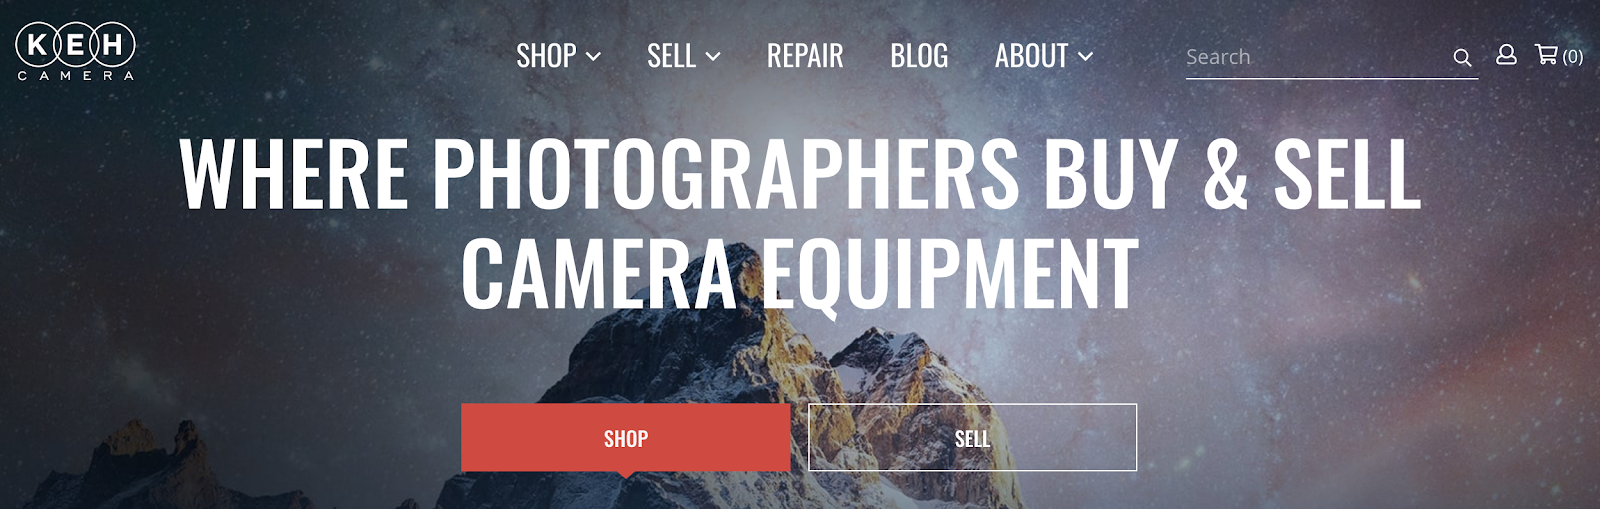 KEH Camera - Where Photographers Buy & Sell Camera Equipment